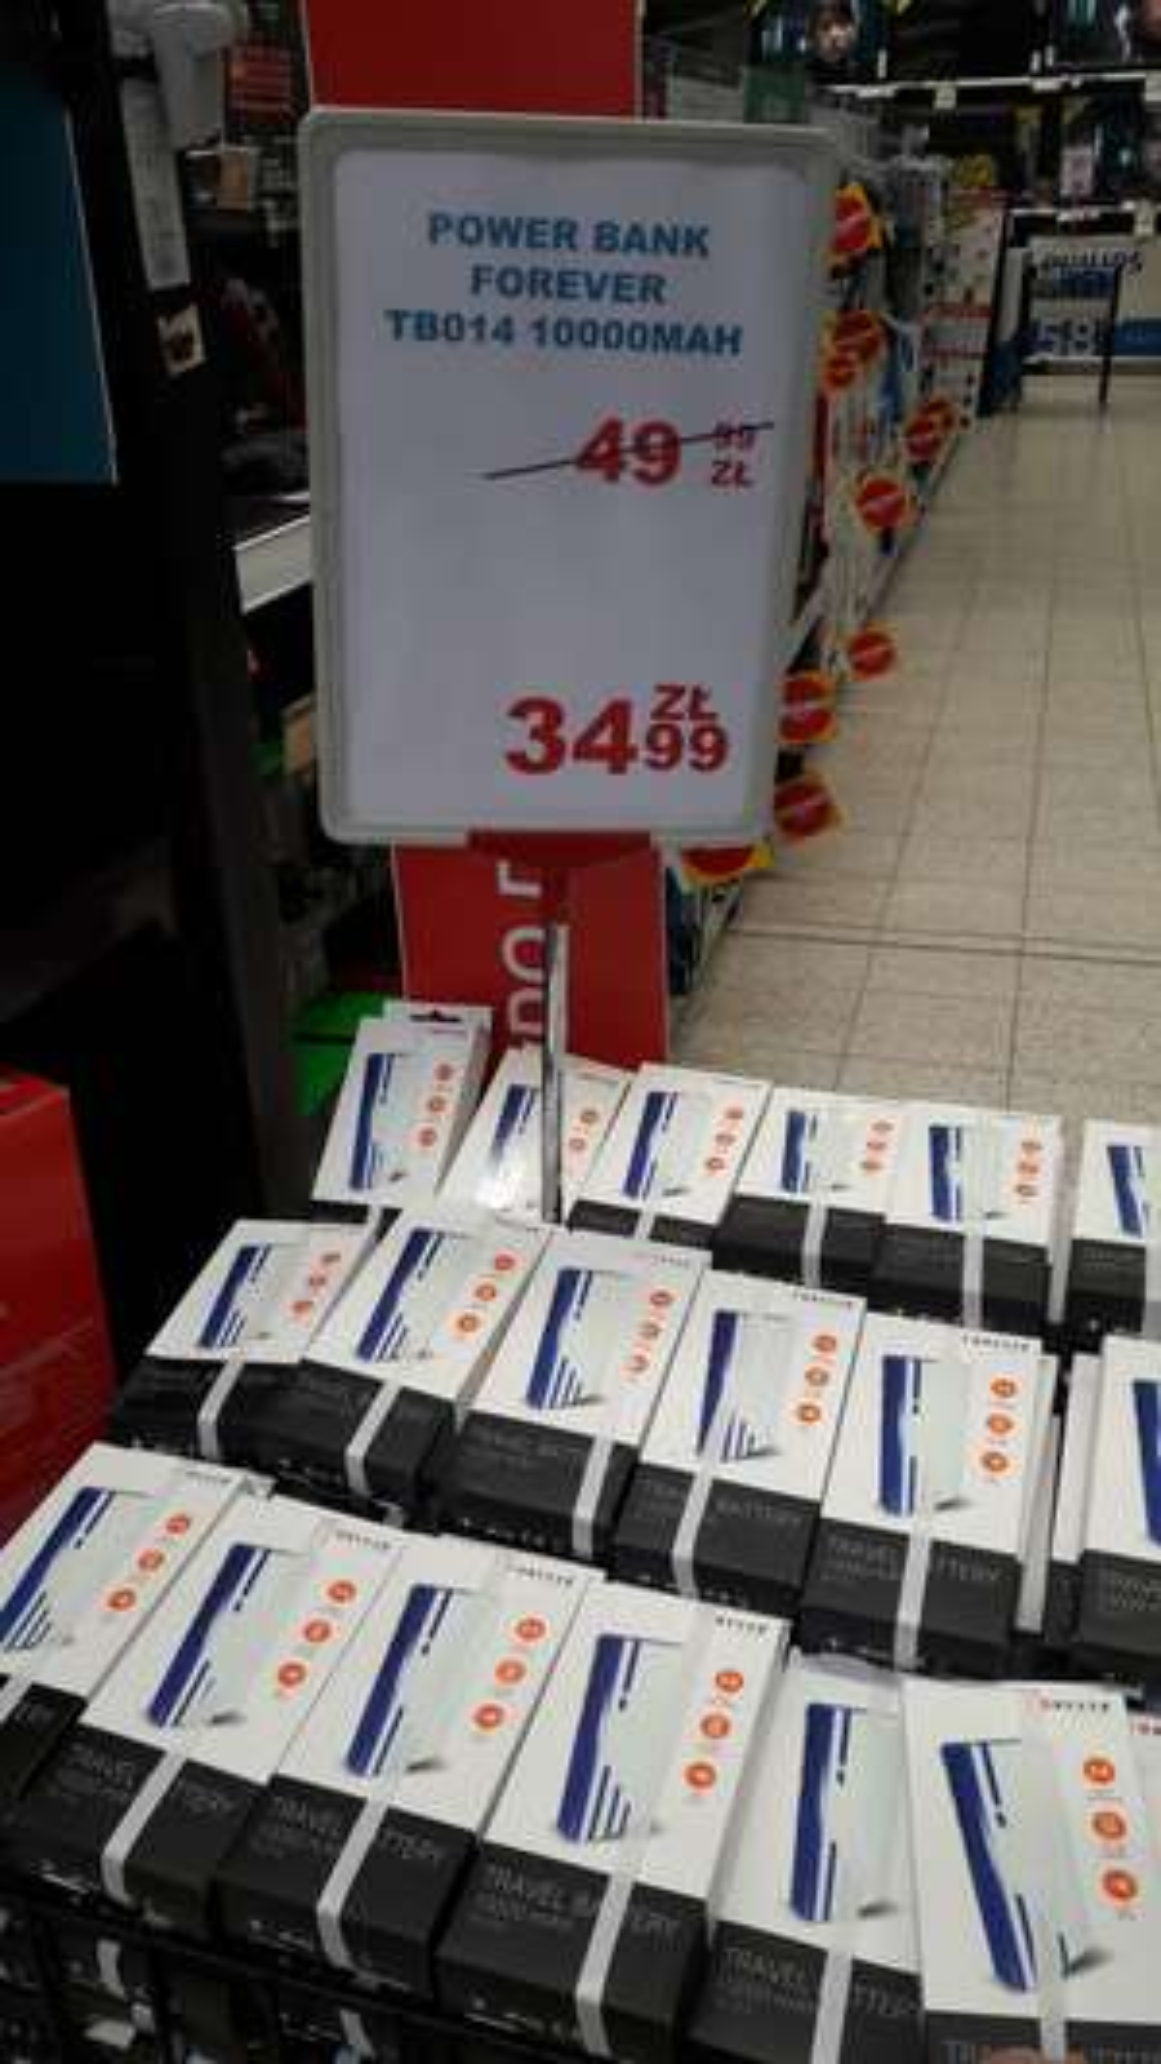 Powerbank Forever 10000 mAh Auchan Częstochowa